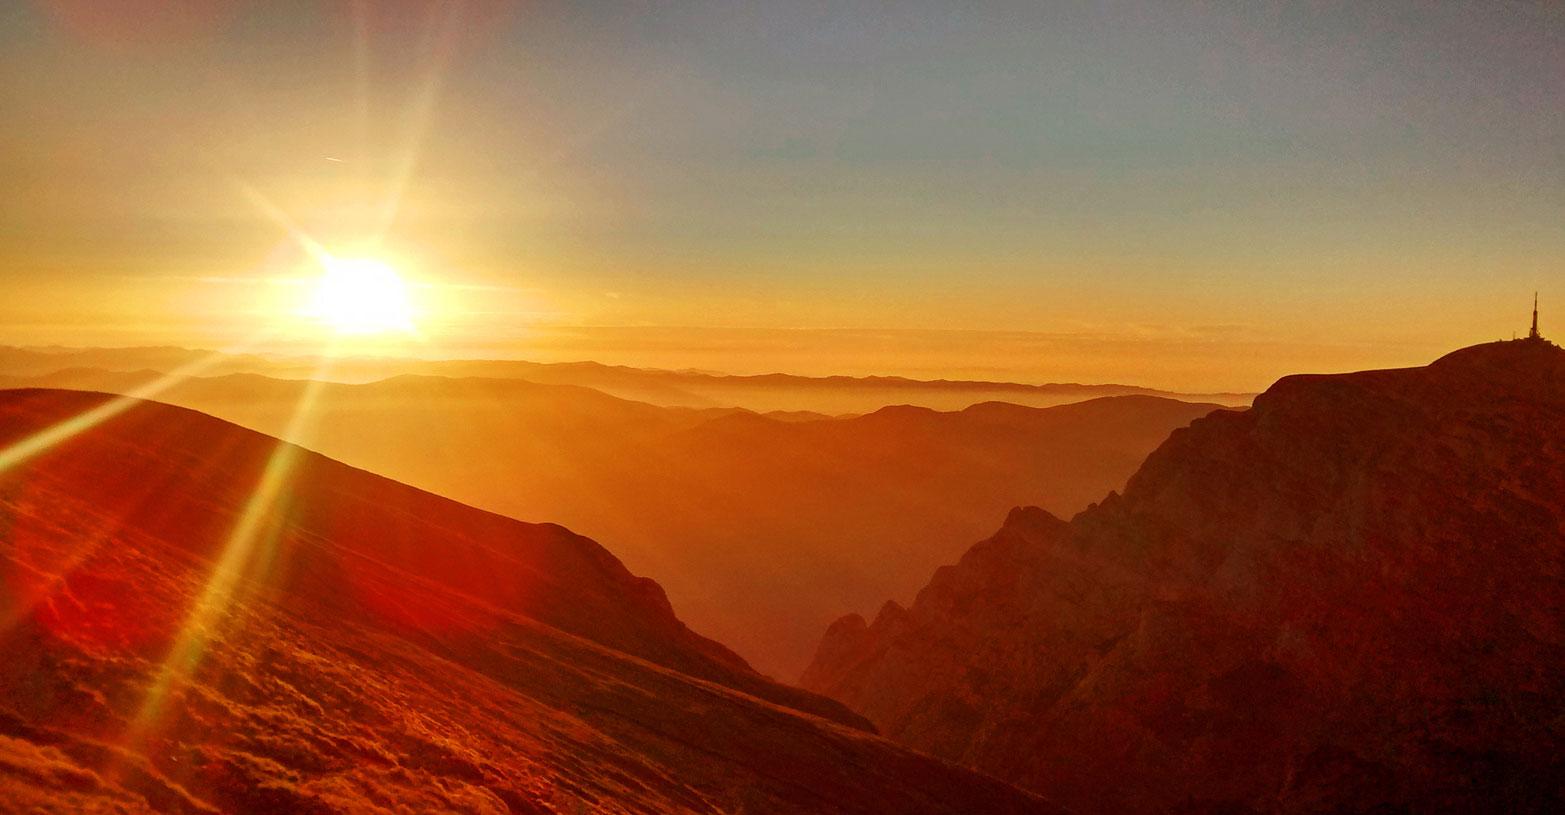 Rasarit de soare, Varful Omu